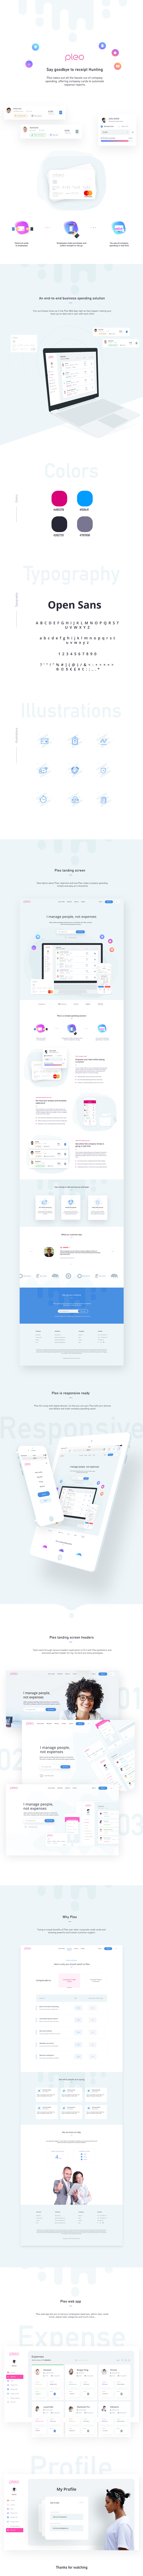 Pleo web prototype by Prakhar Neel Sharma - Creative Work